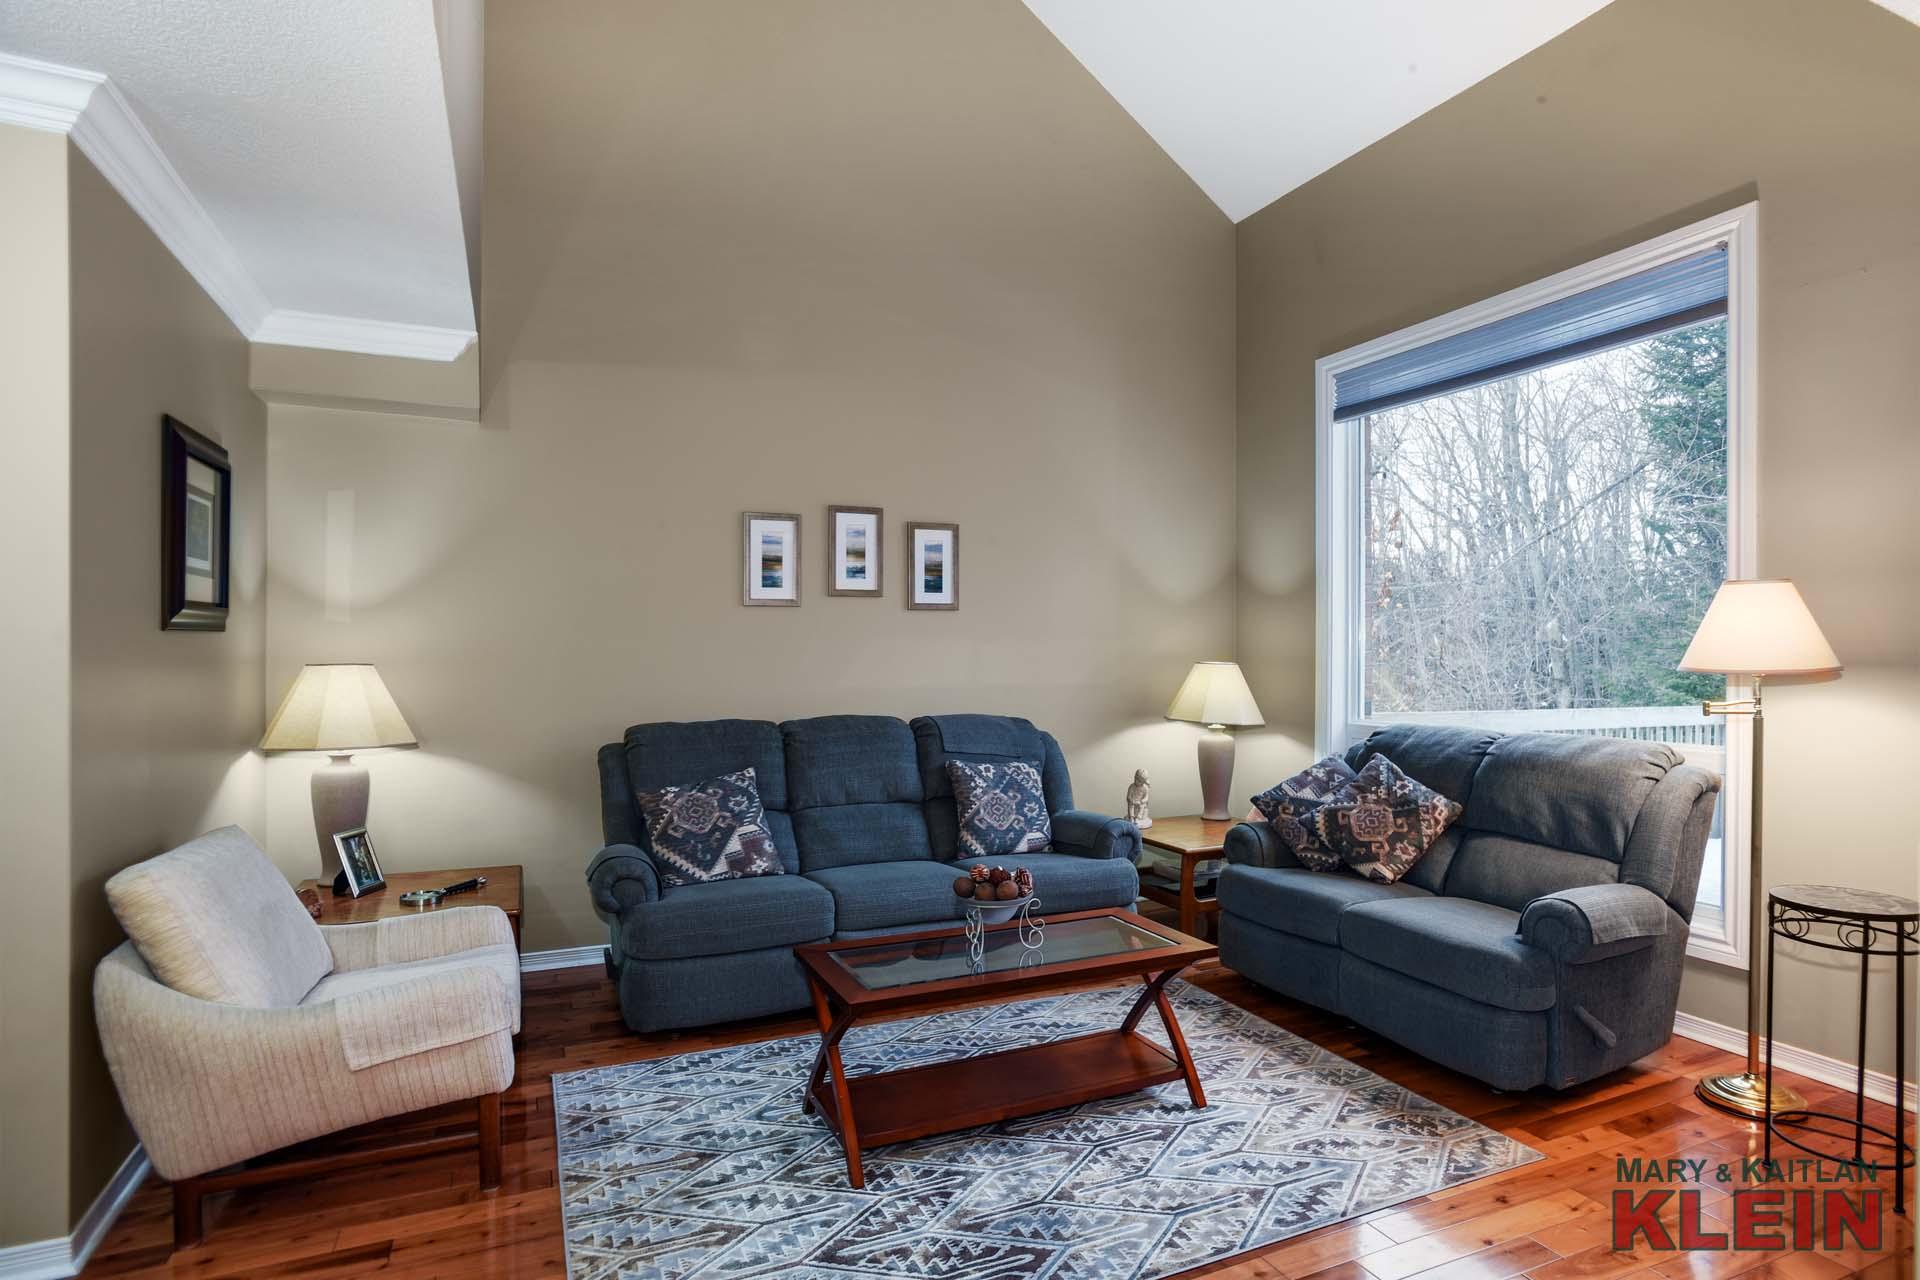 Living Room - Pine Floors, Large Window Overlooking Backyard